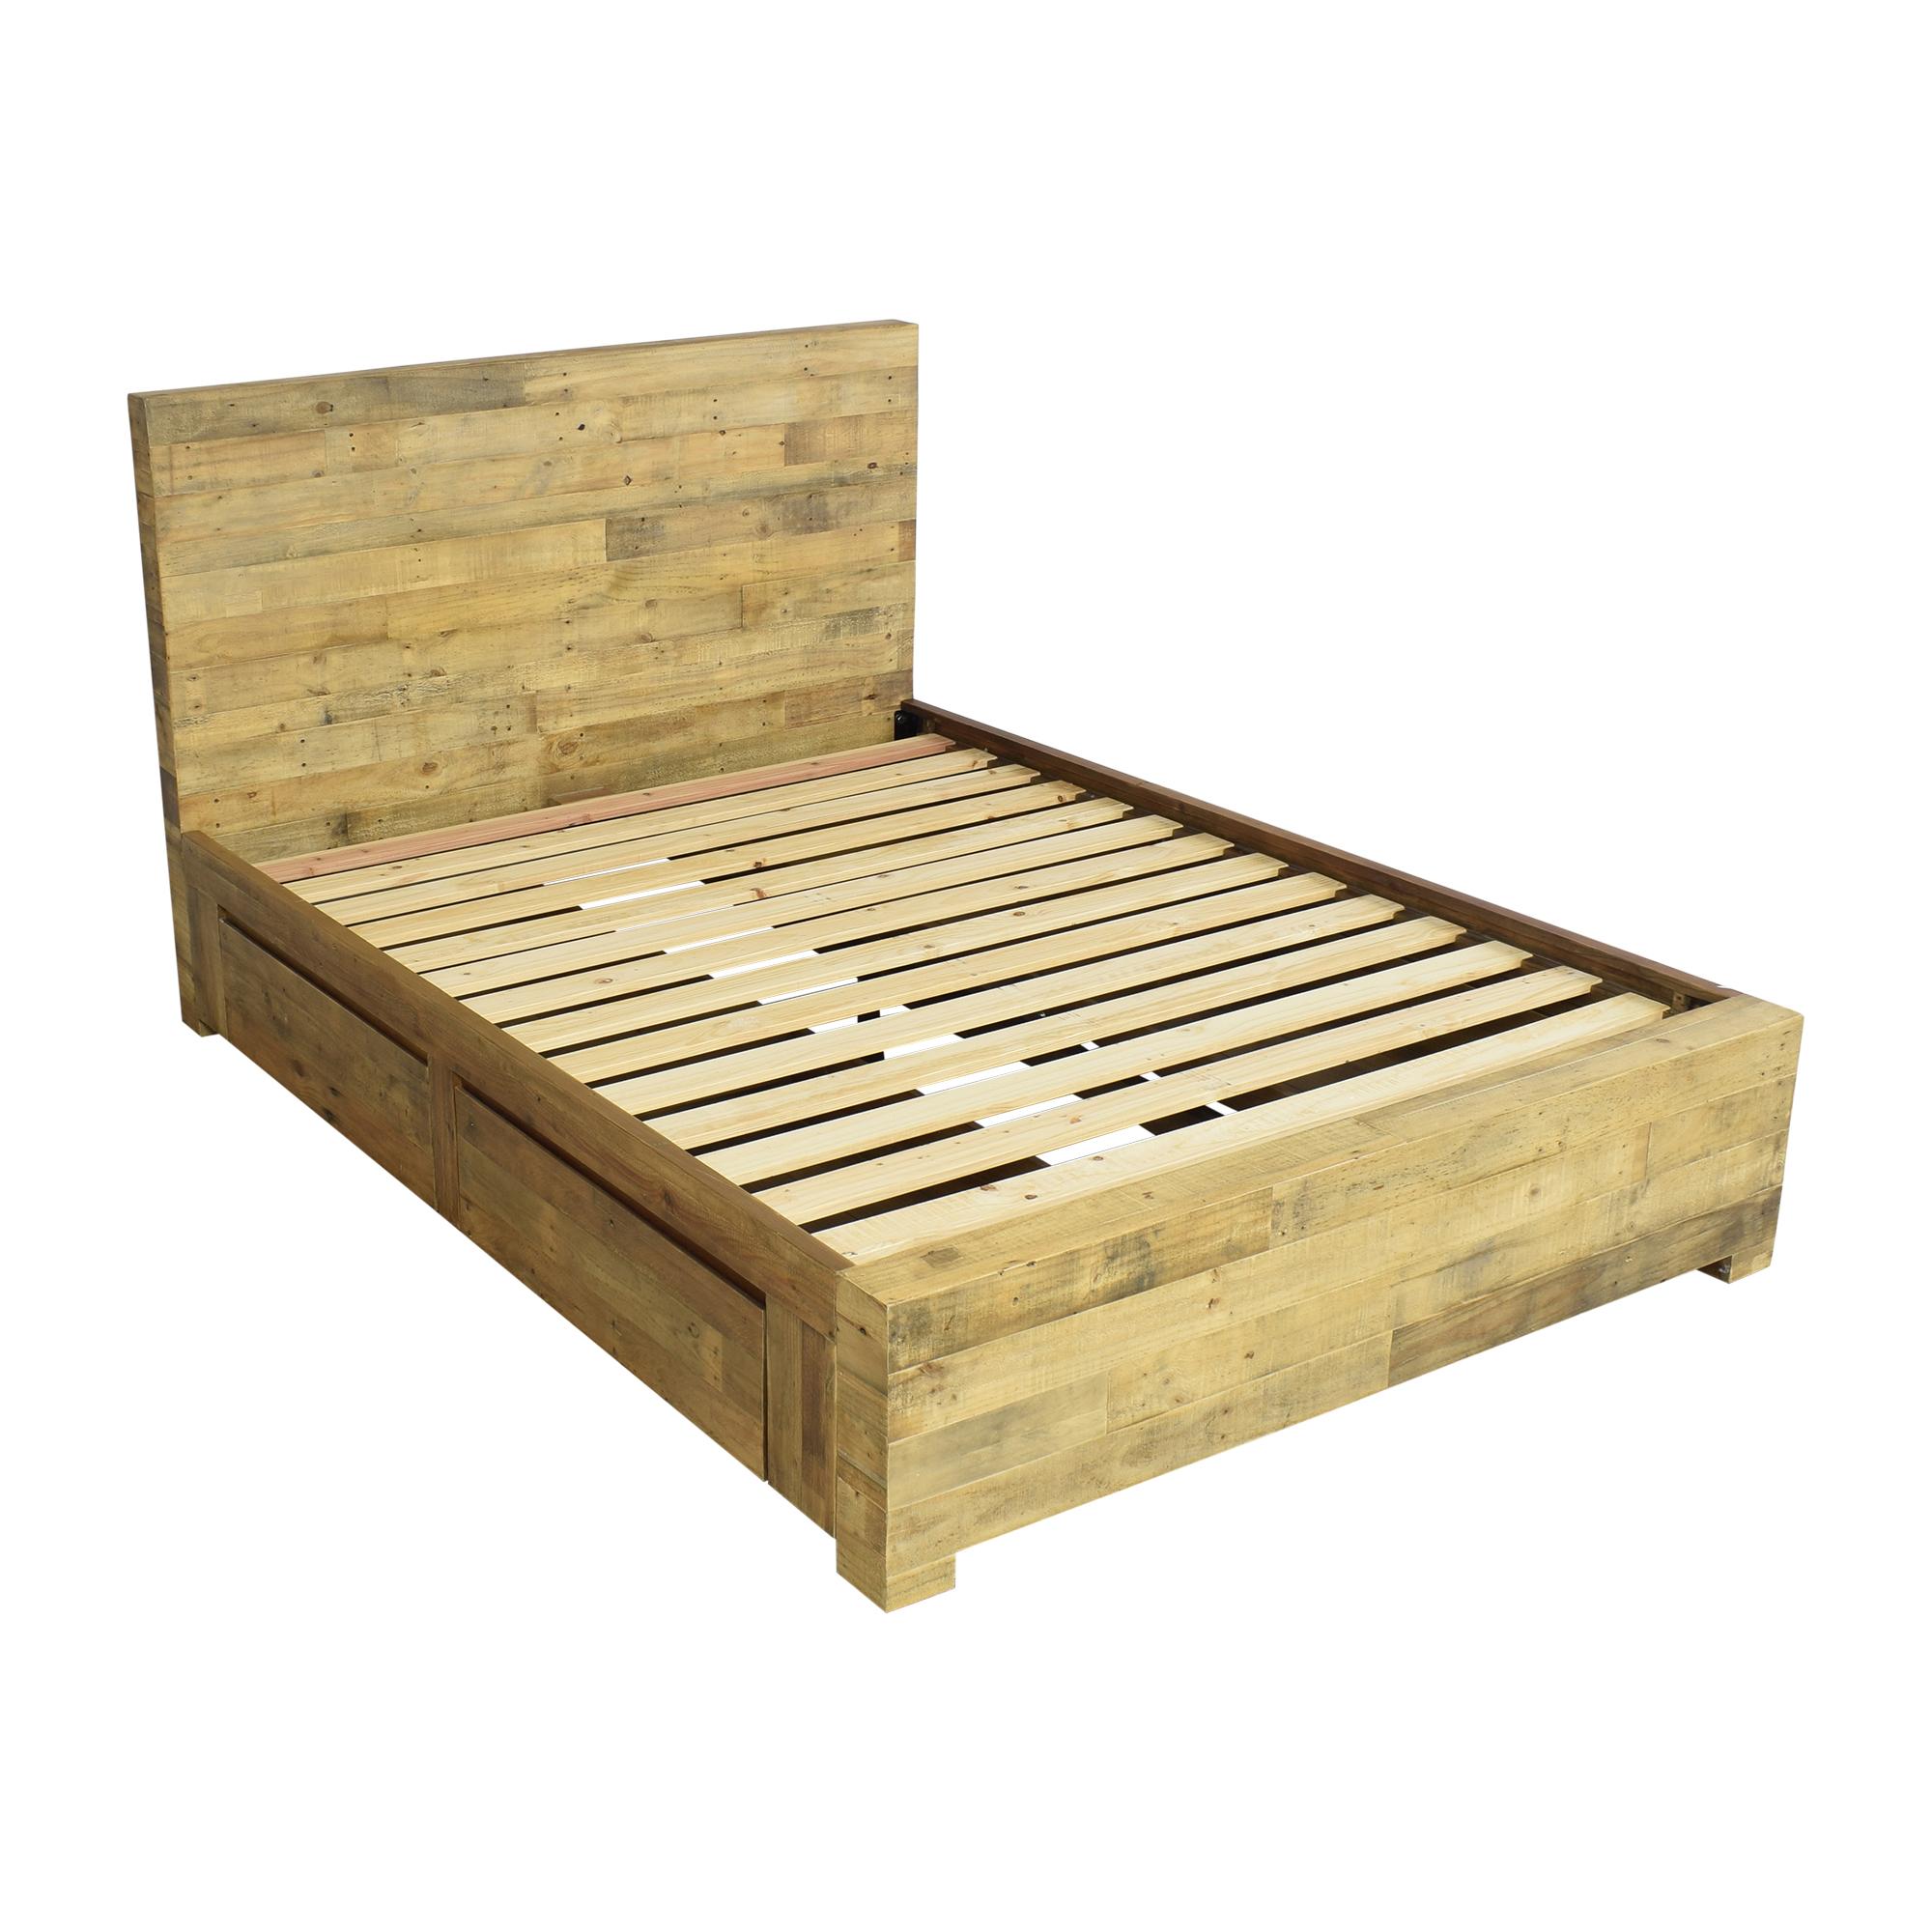 West Elm West Elm Emmerson Reclaimed Storage Queen Bed